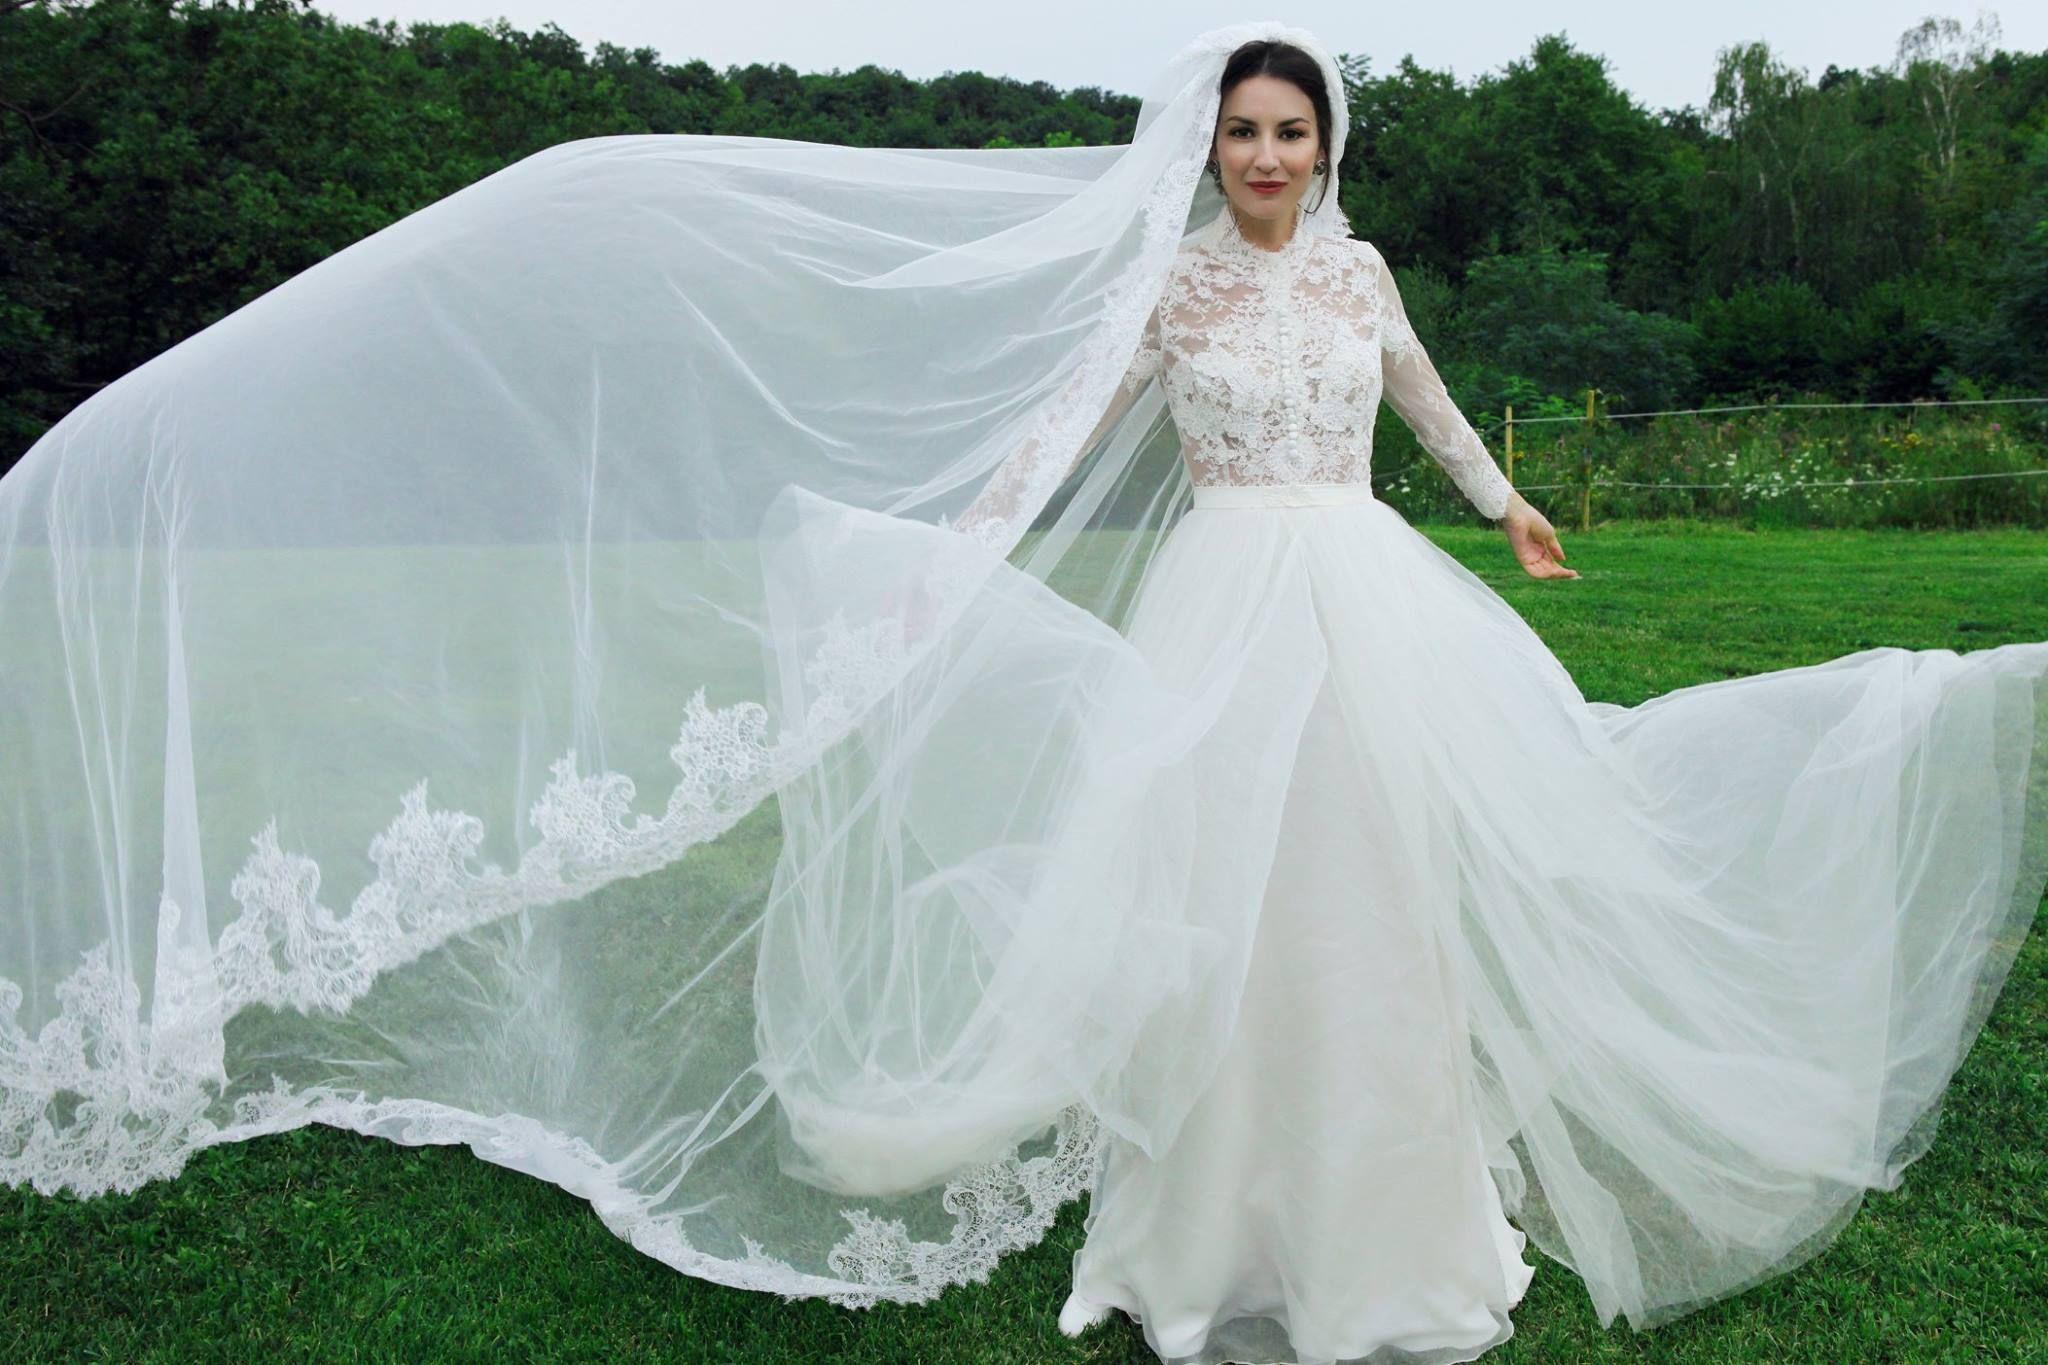 Tamara Šimončíková - Heribanová dress: Lukáš Kimlička | Once upon a ...